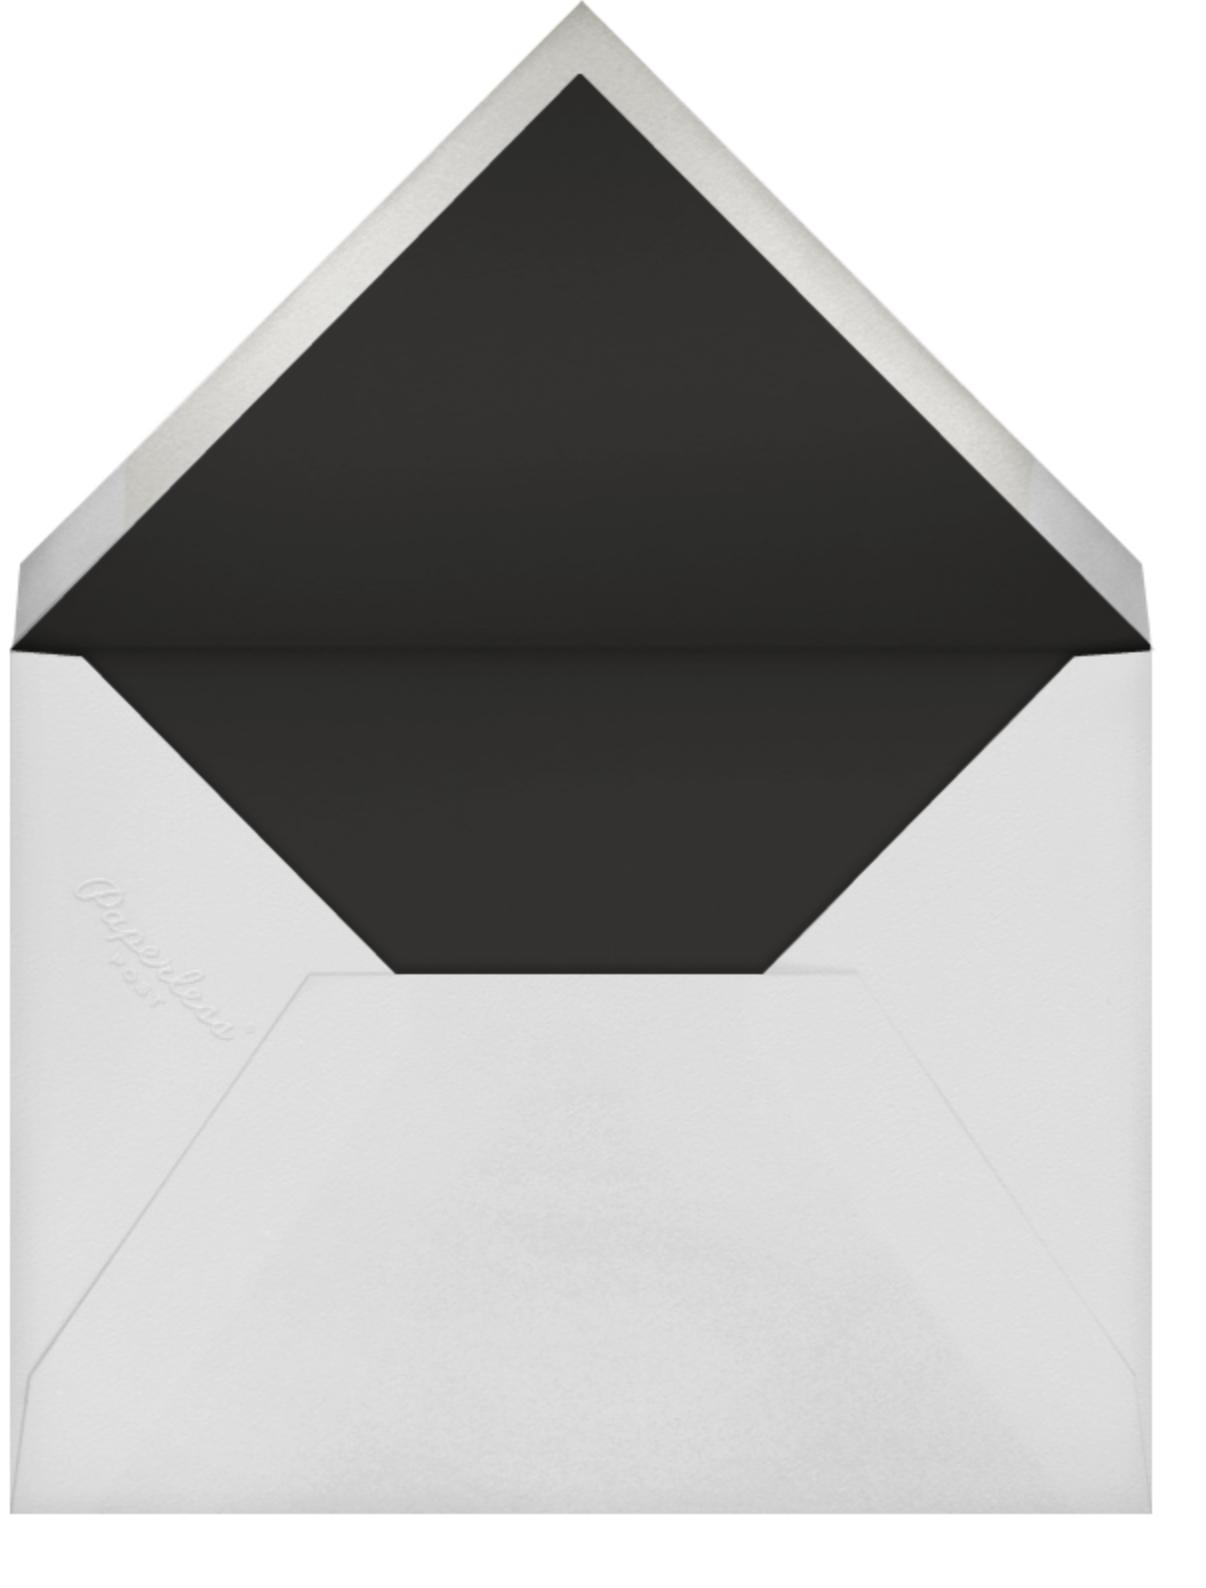 Pop Carnation (Stationery) - Oscar de la Renta - Envelope